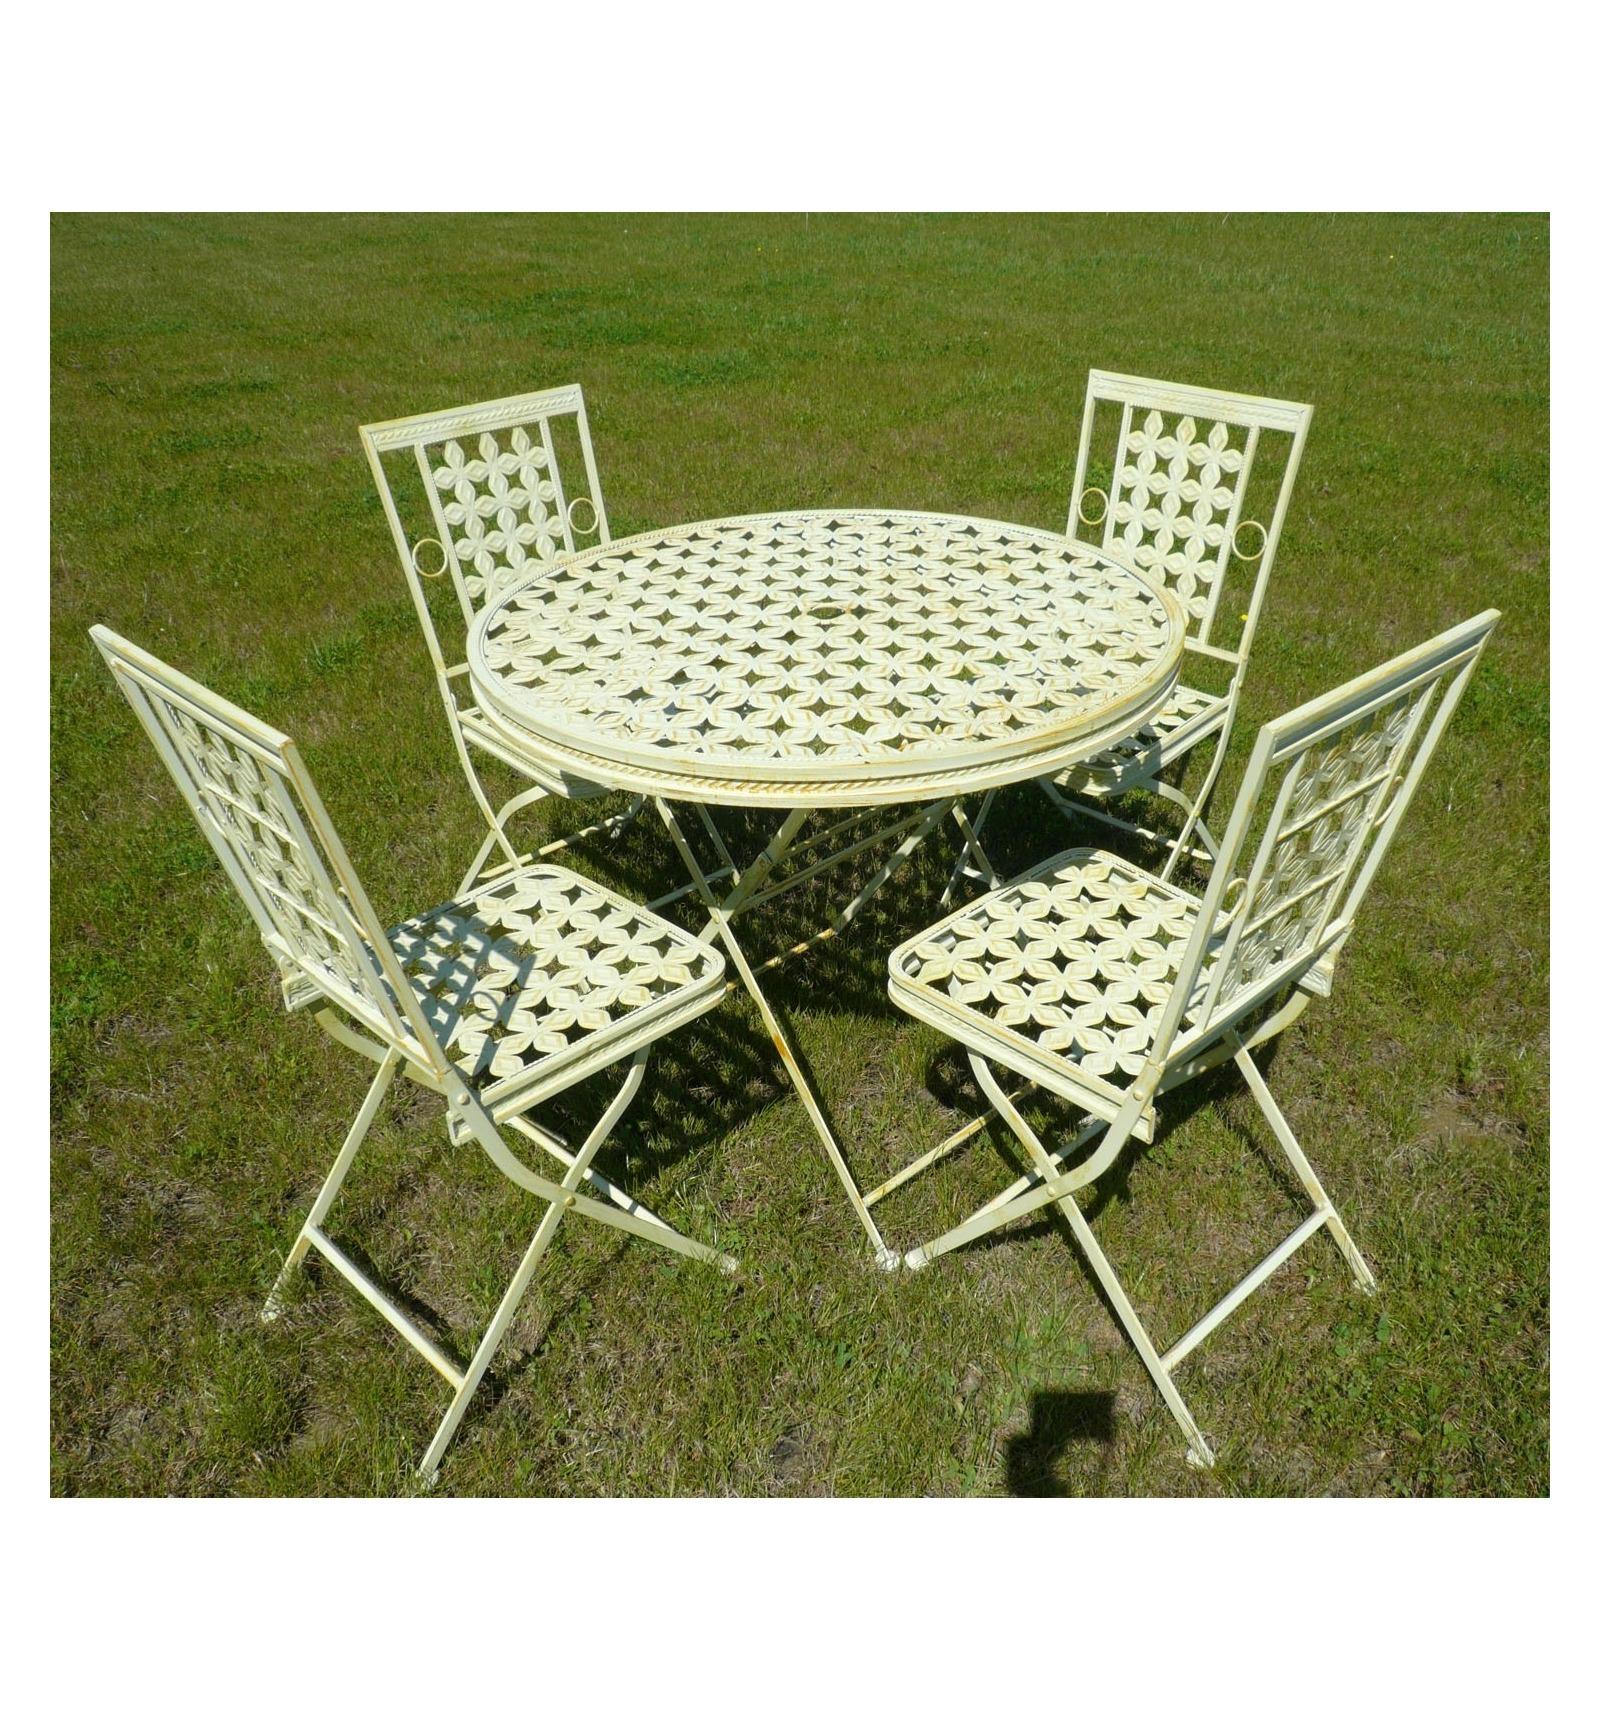 Mobili da giardino in ferro battuto tavoli sedie - Mobili da giardino in ferro ...